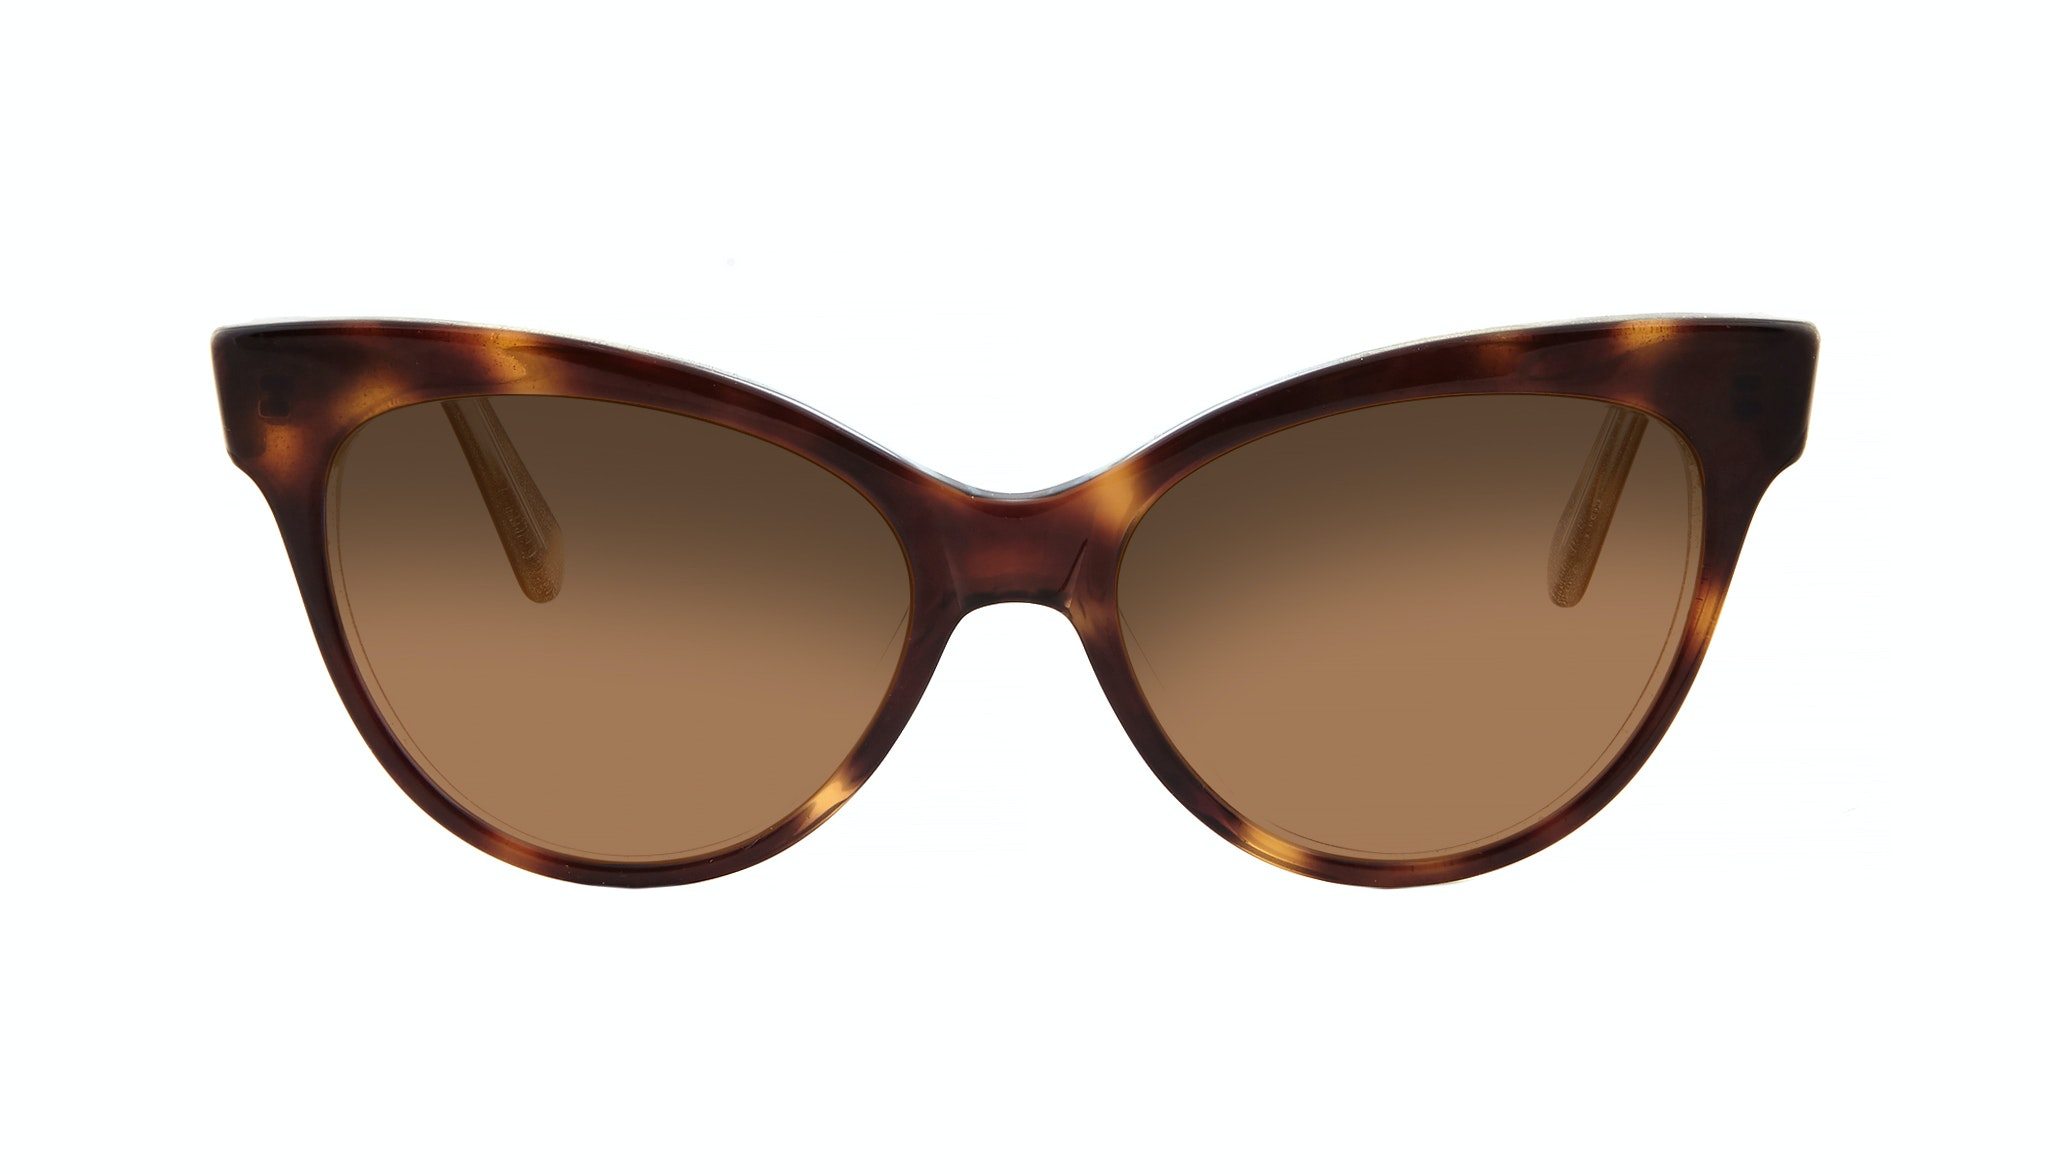 Affordable Fashion Glasses Cat Eye Daring Cateye Sunglasses Women SkunkBoy Twinkle Tort Front